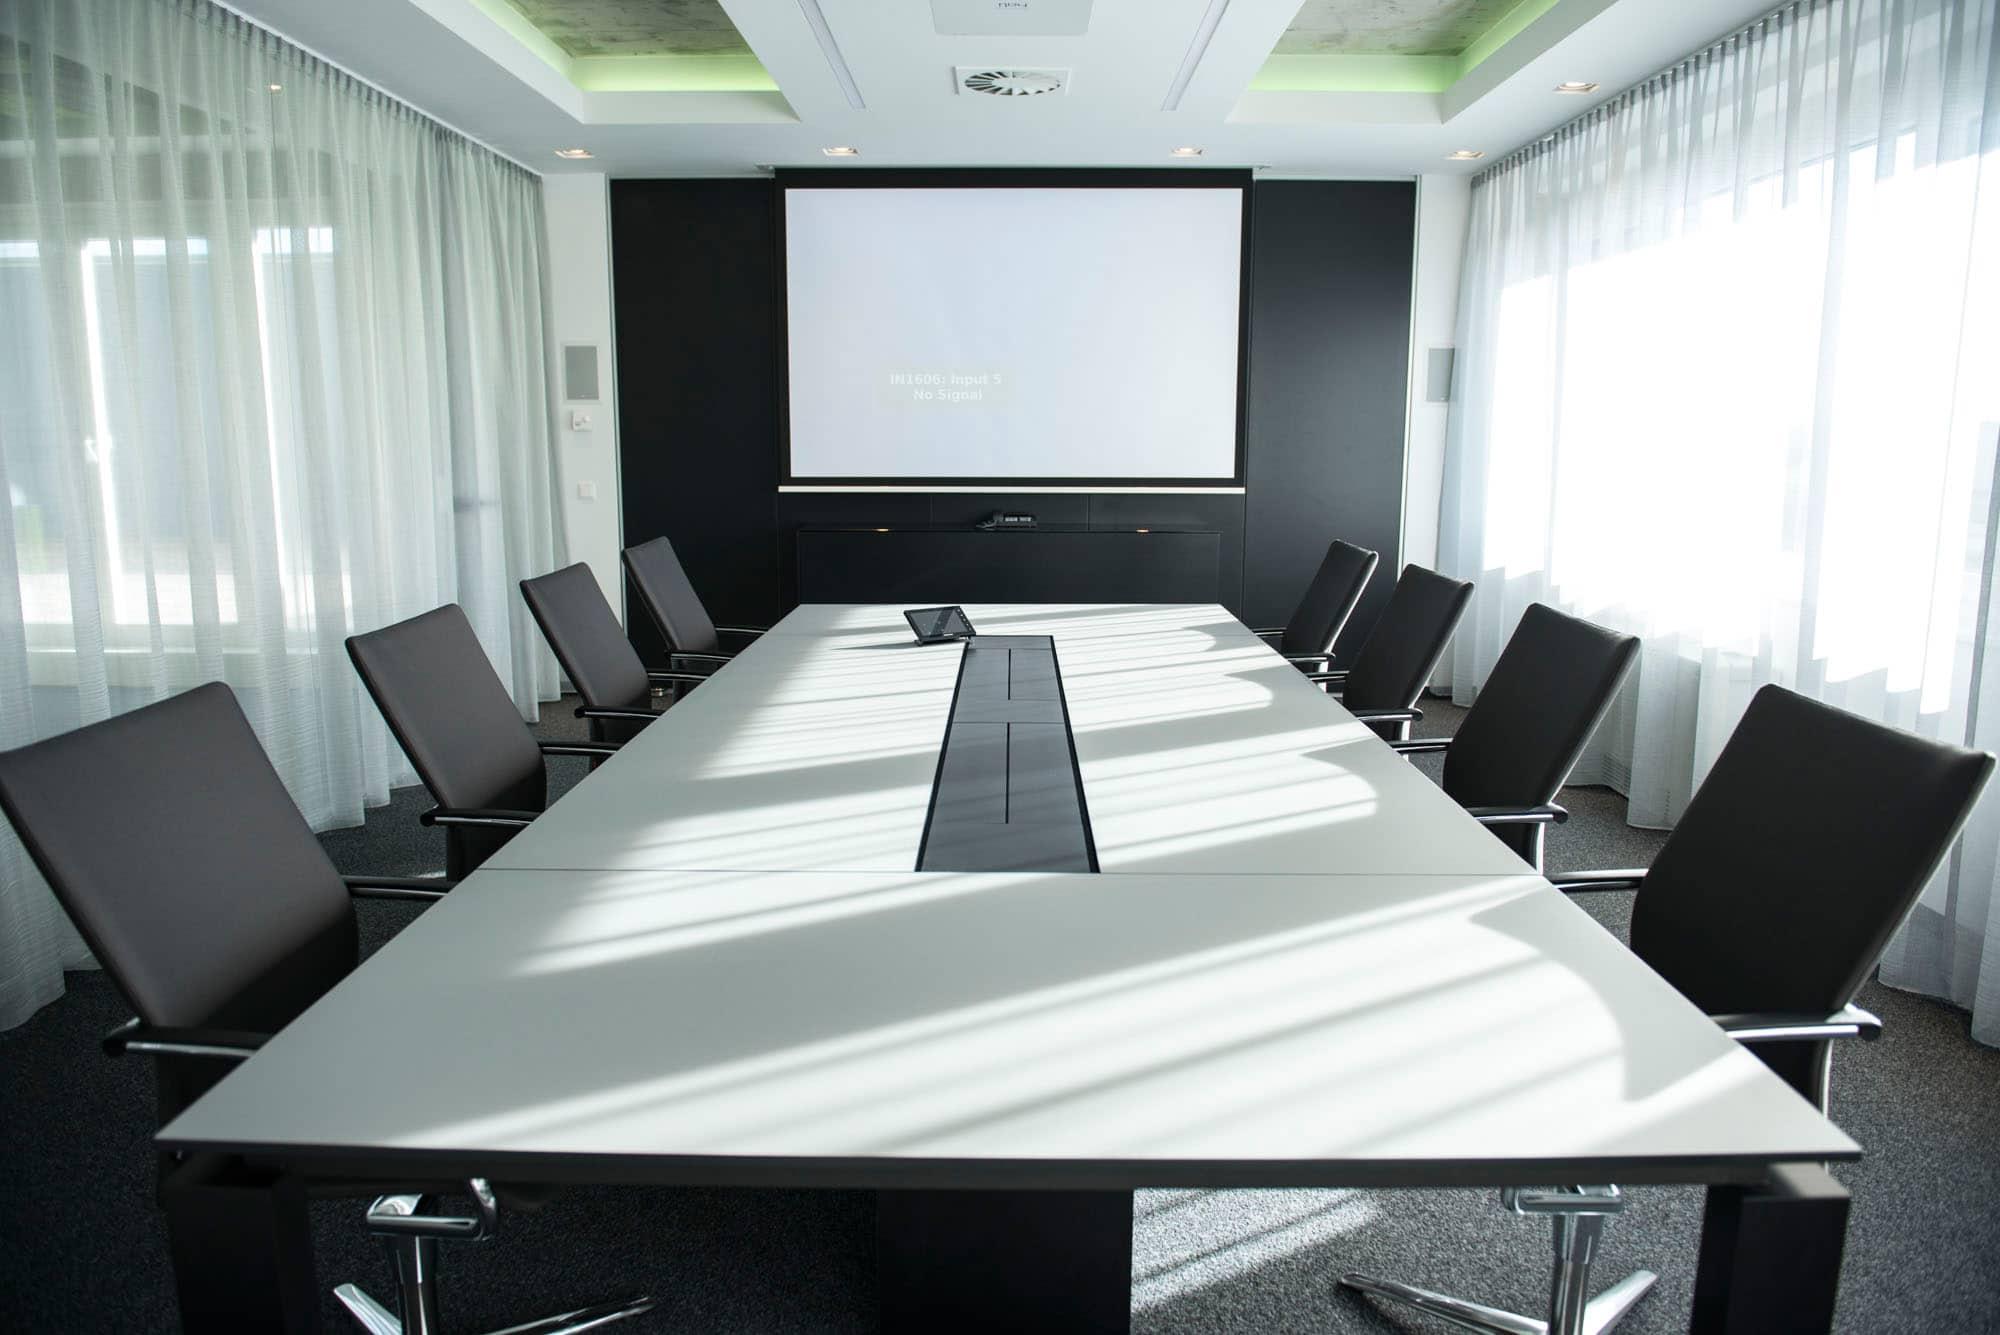 hali Büromöbel, s800, Konferenztisch, Meeting, Besprechung, Management, Chefmöbel